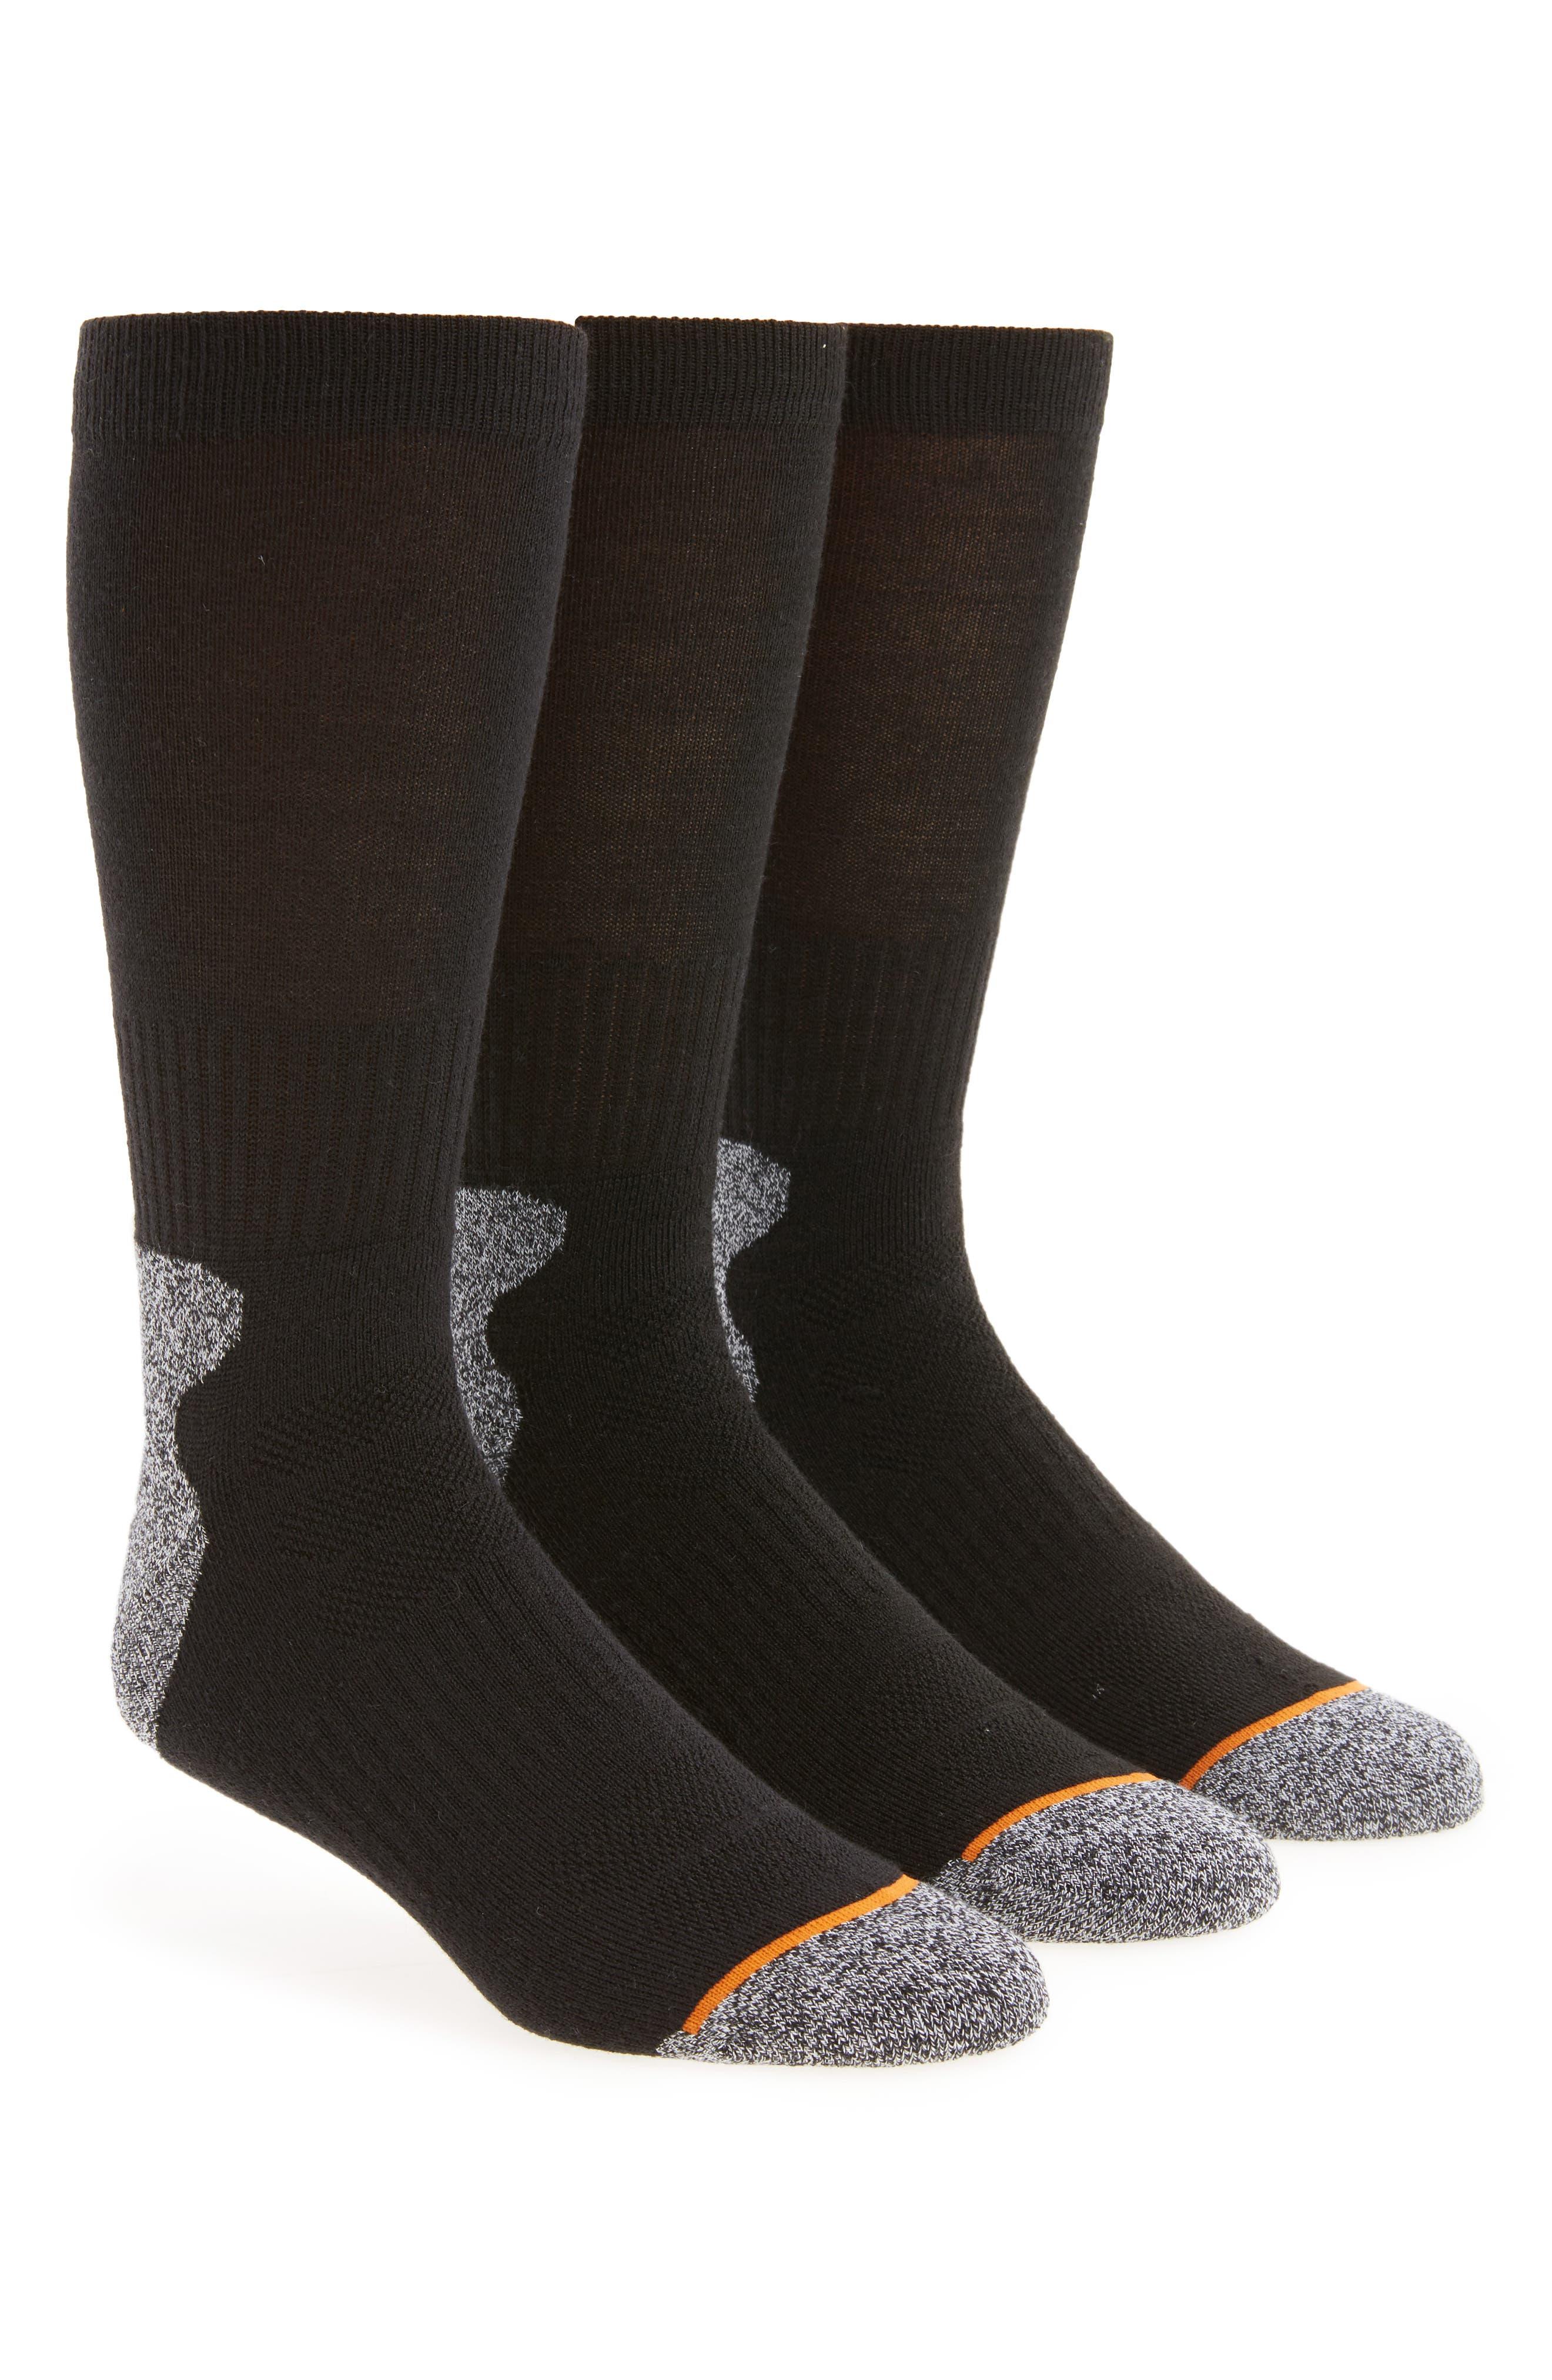 Nordstrom Men's Shop 3-Pack Assorted Boot Socks